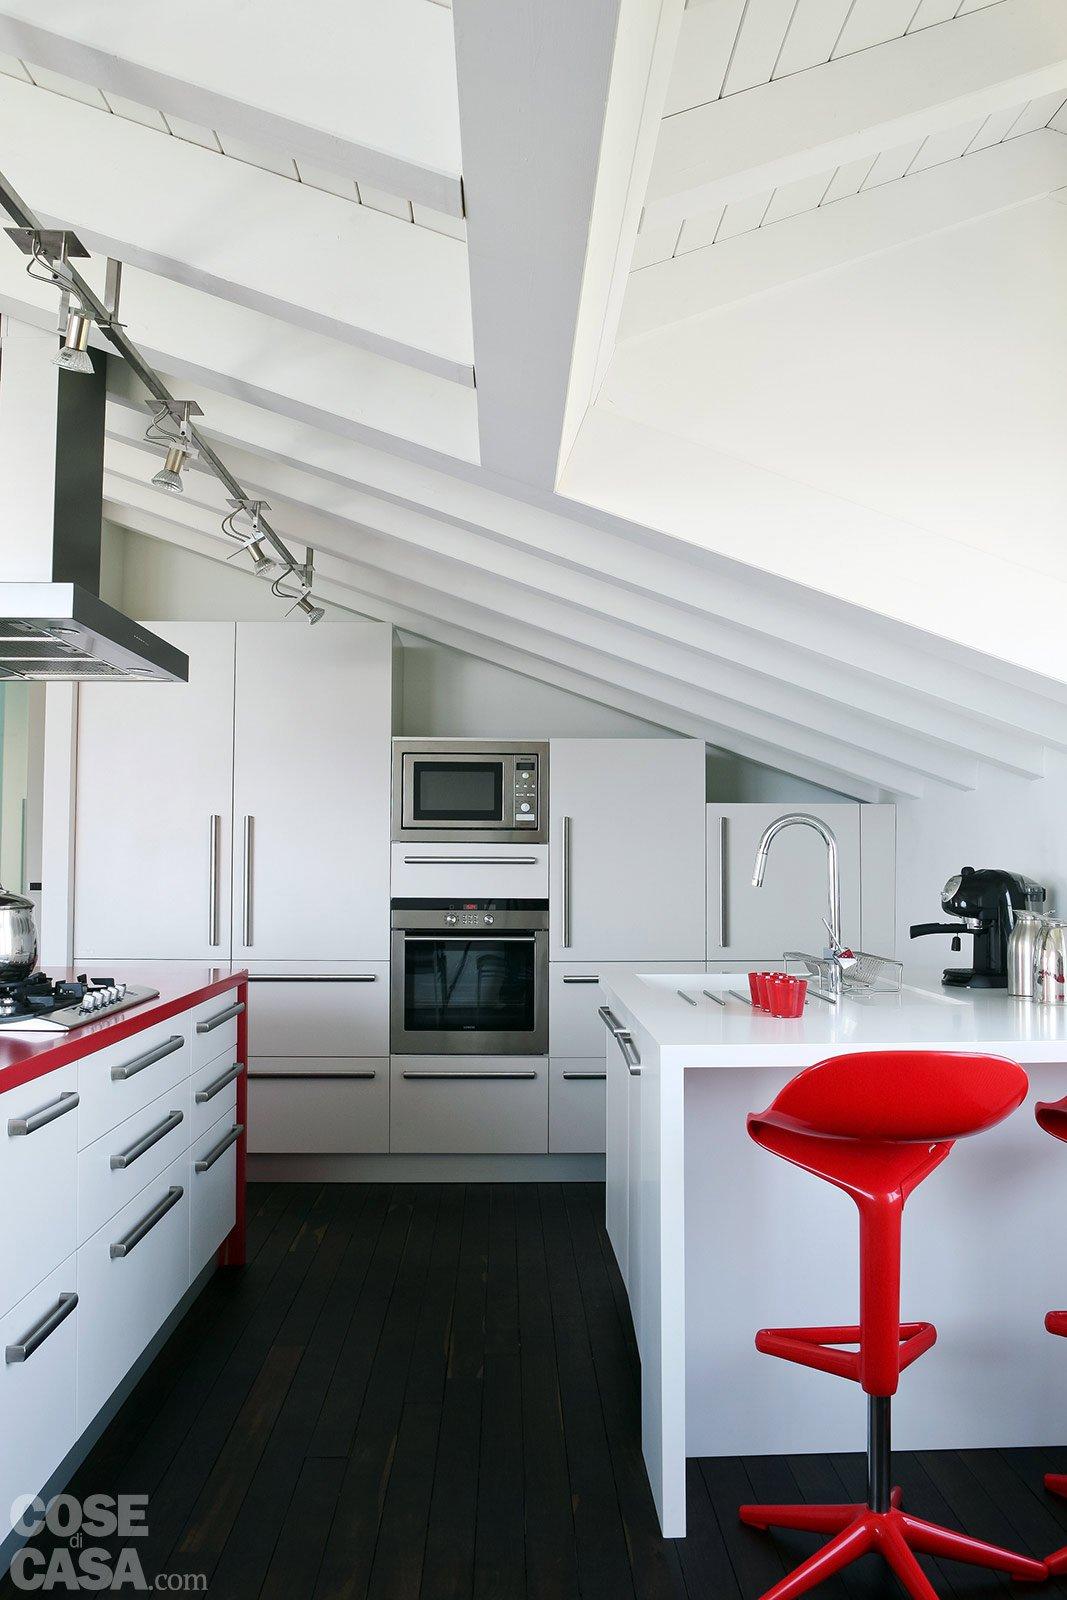 Piastrelle Per Cucina In Offerta : Mattonelle per cucina in ...